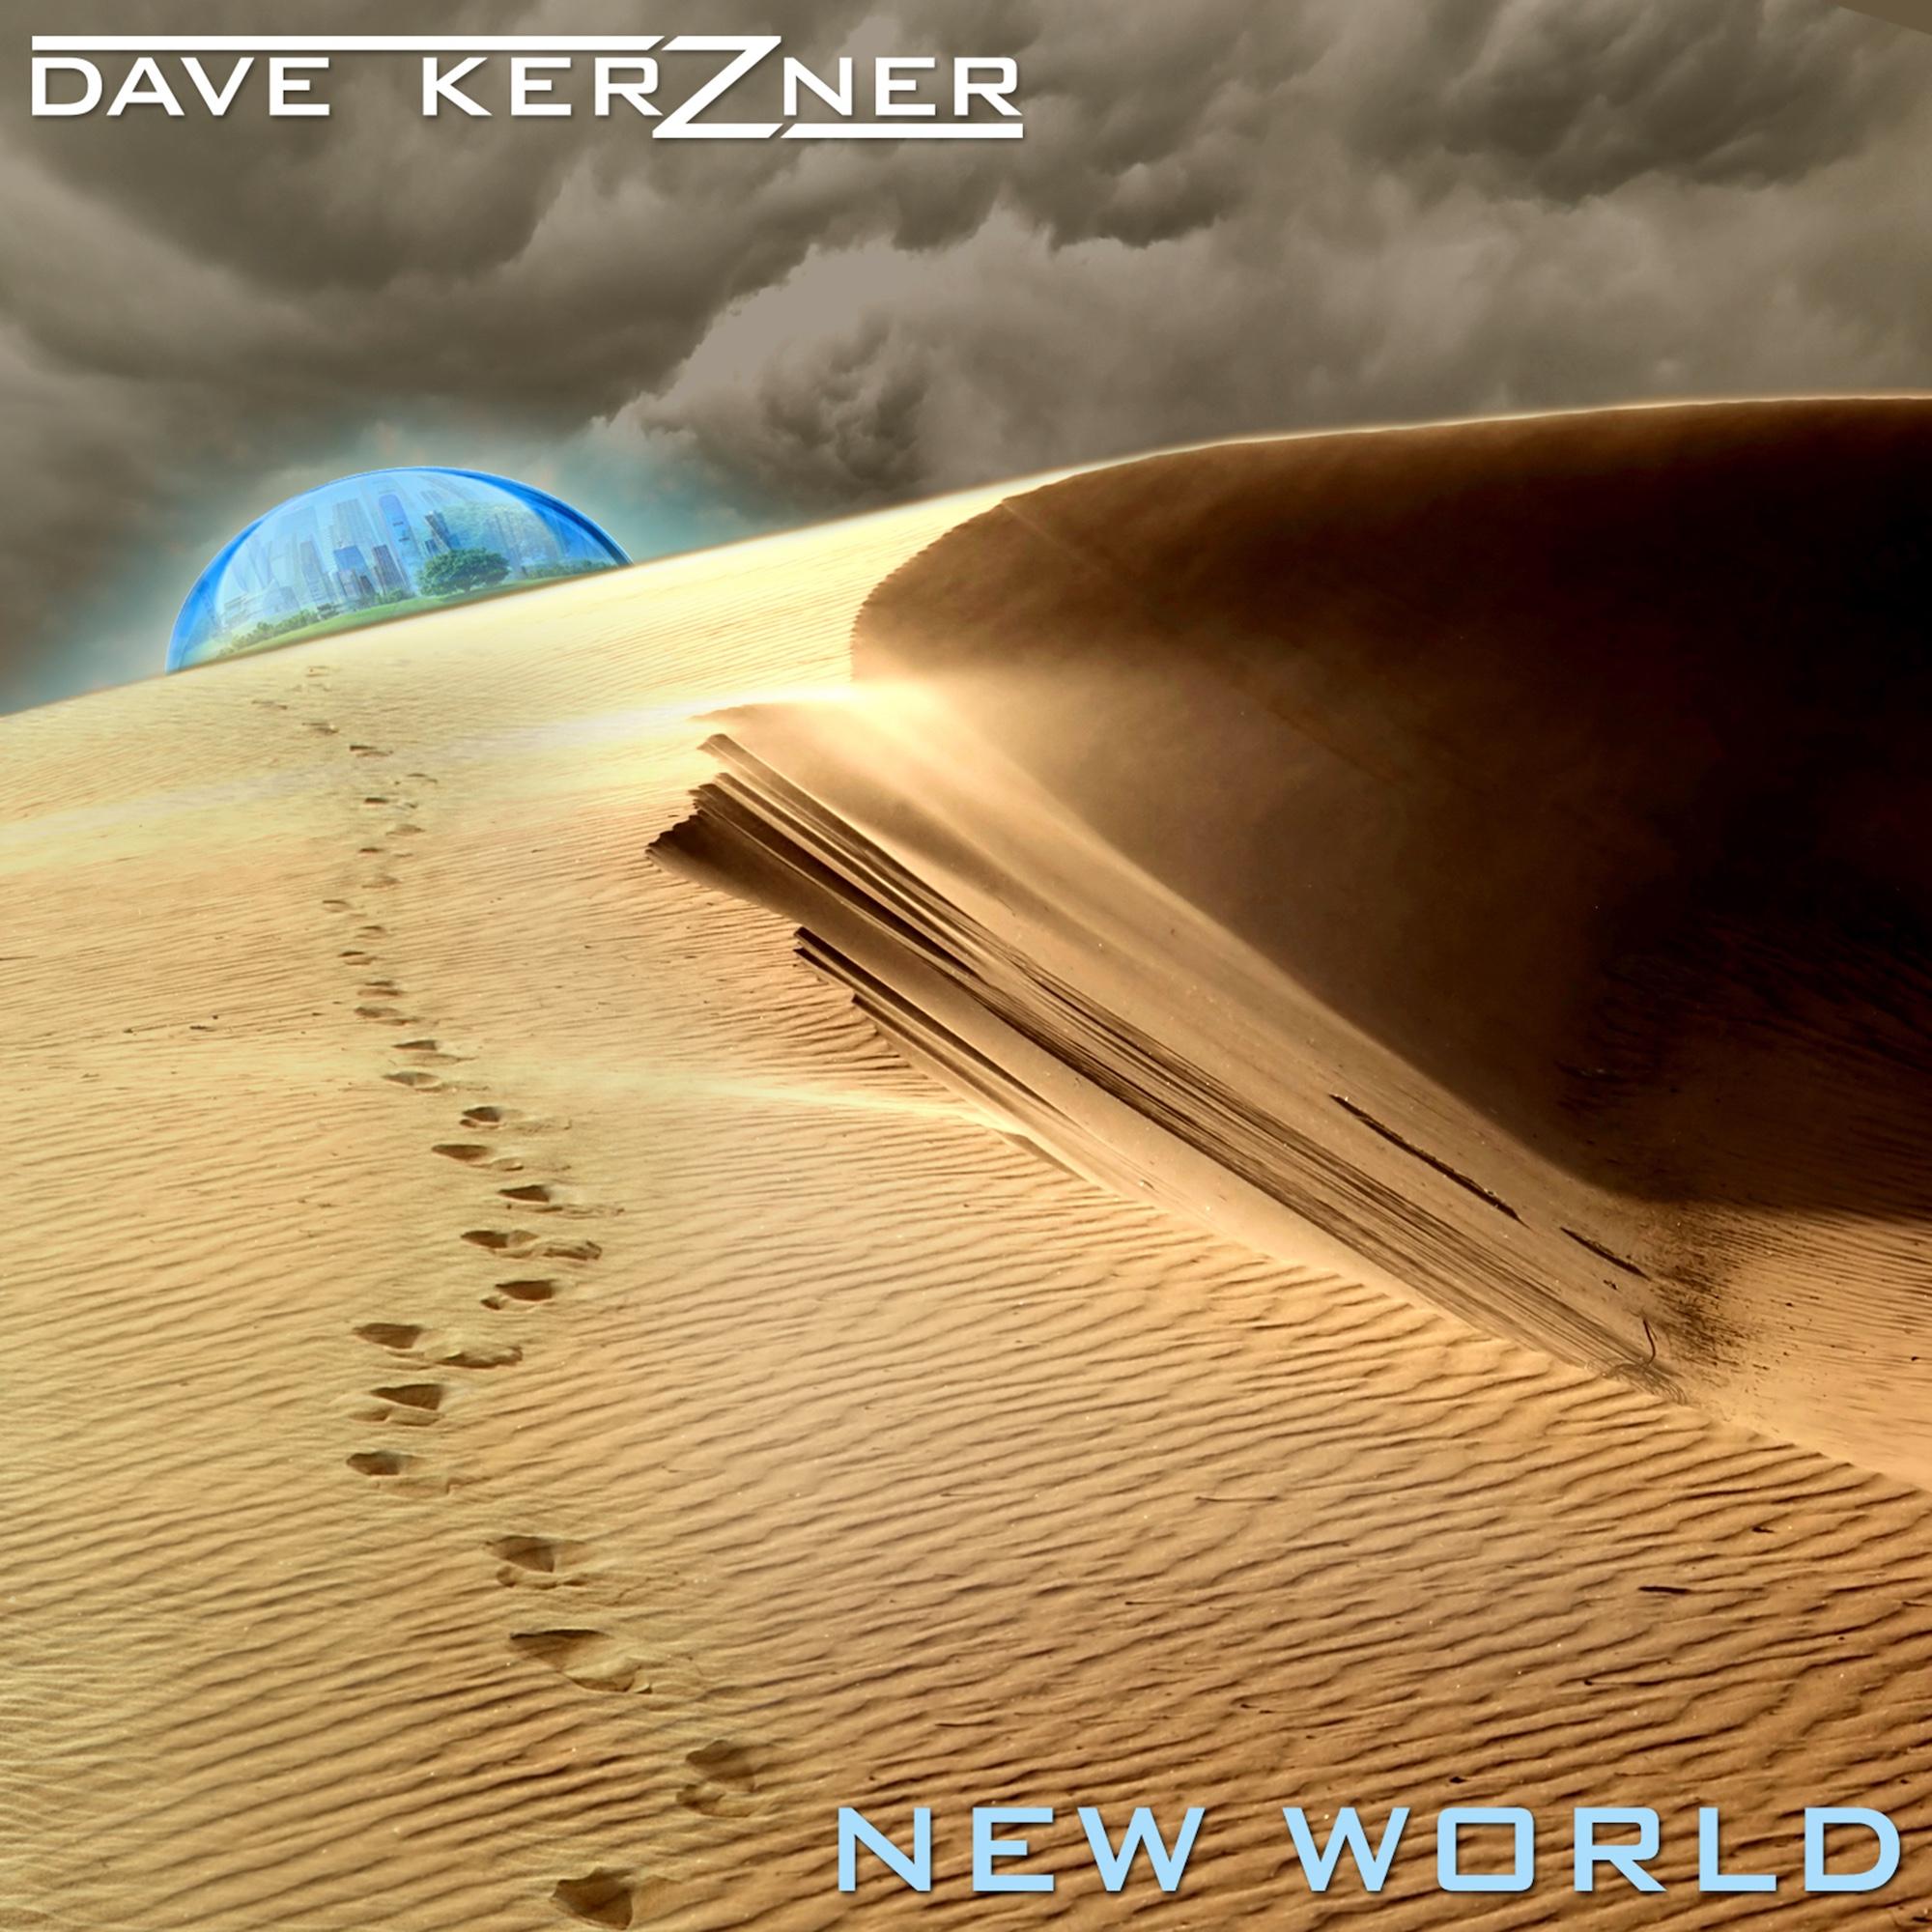 Dave Kerzner: New World